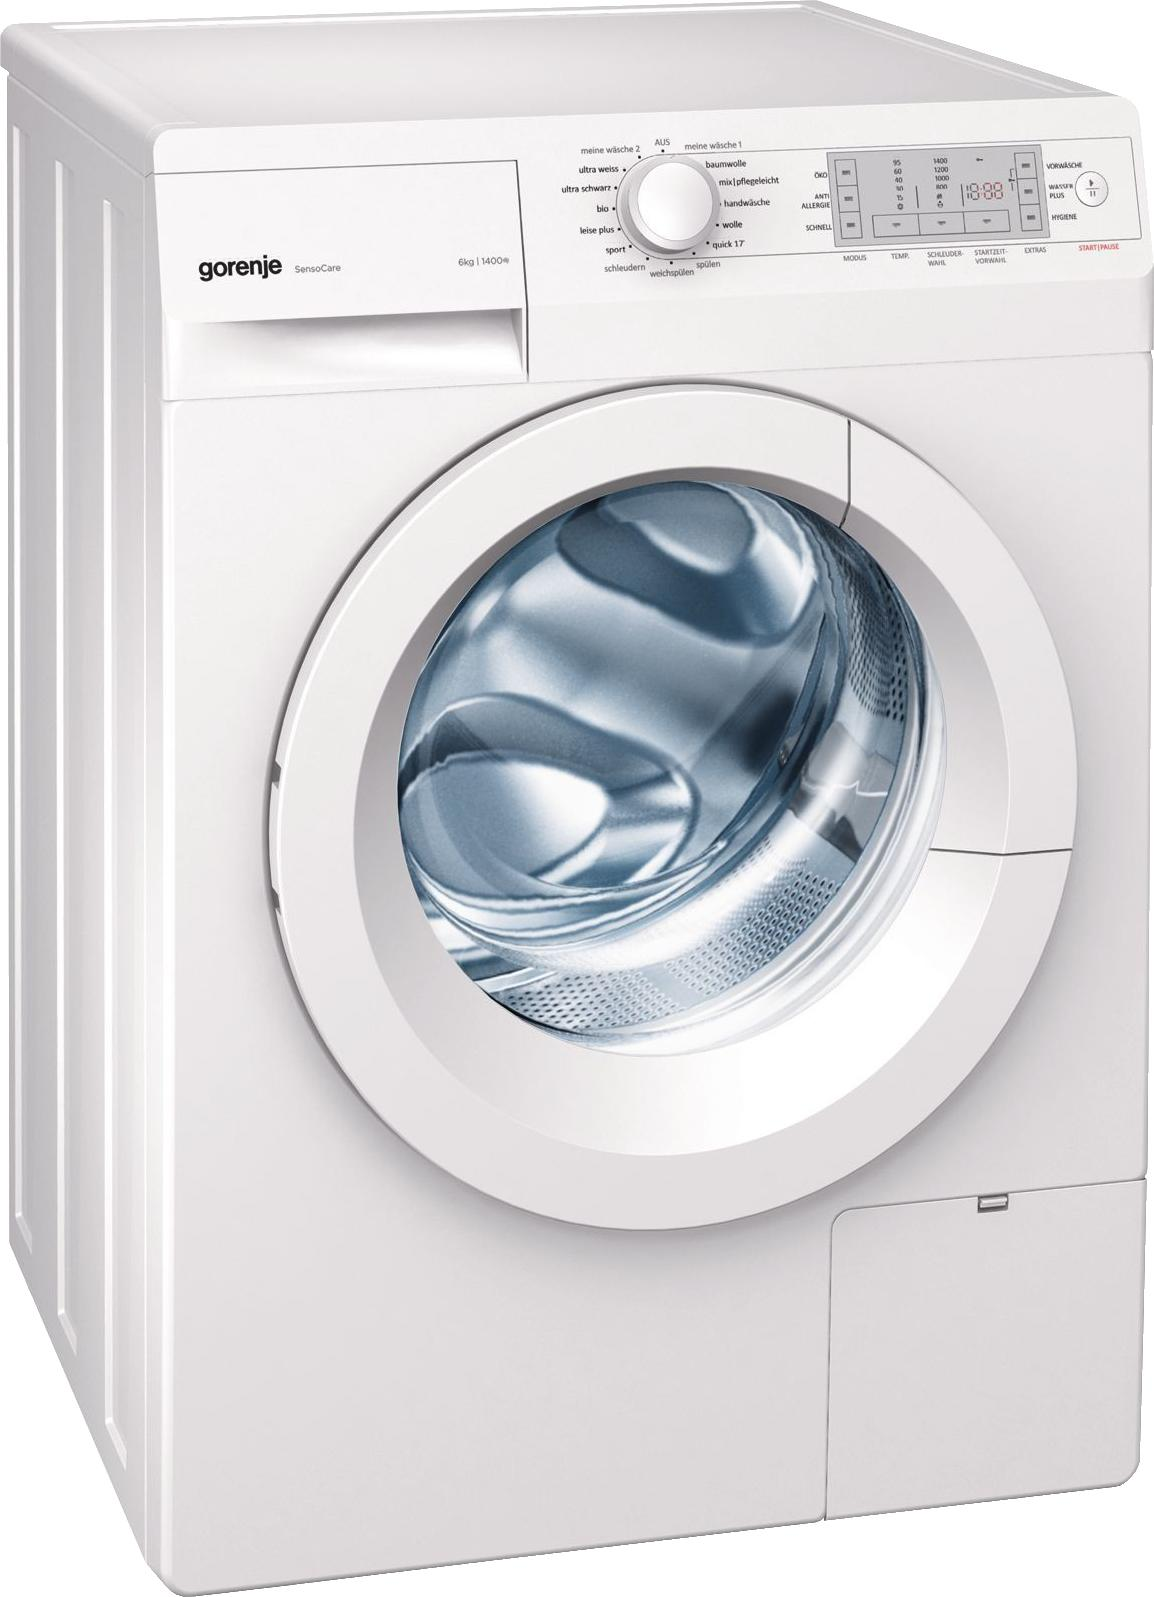 whirlpool wtw4900aw vs gorenje w6443 compare washing. Black Bedroom Furniture Sets. Home Design Ideas